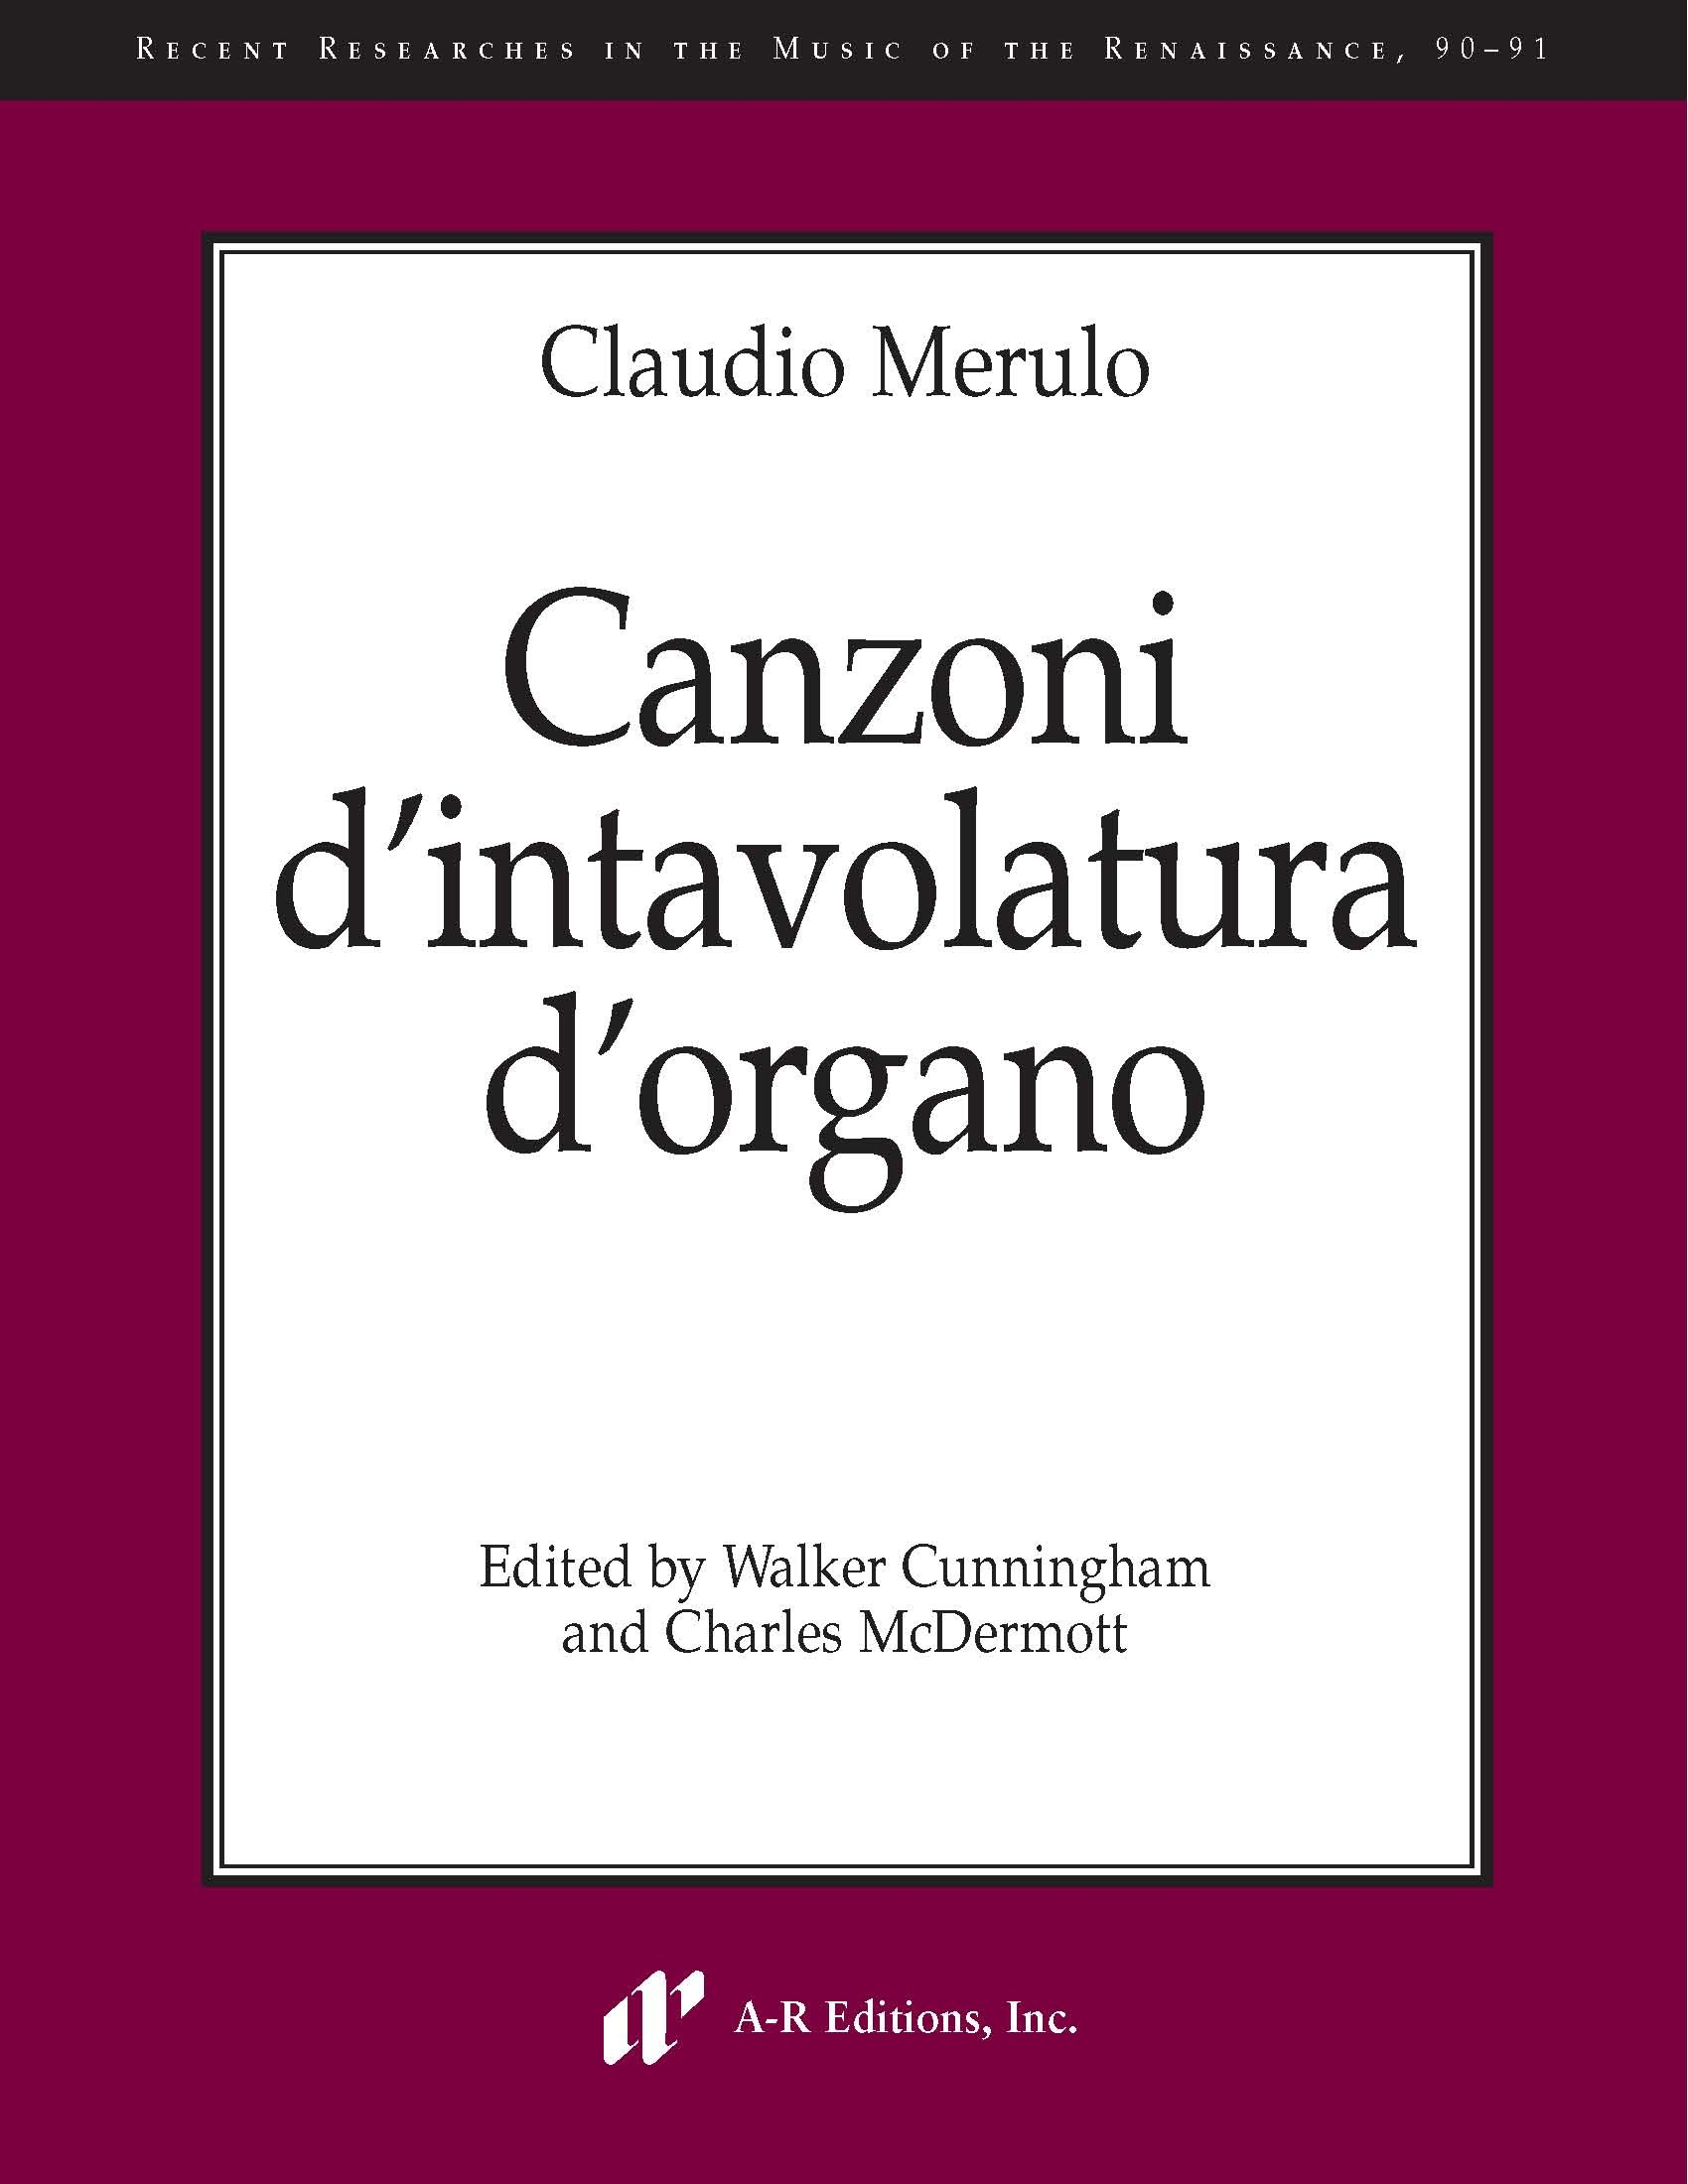 Merulo: Canzoni d'intavolatura d'organo